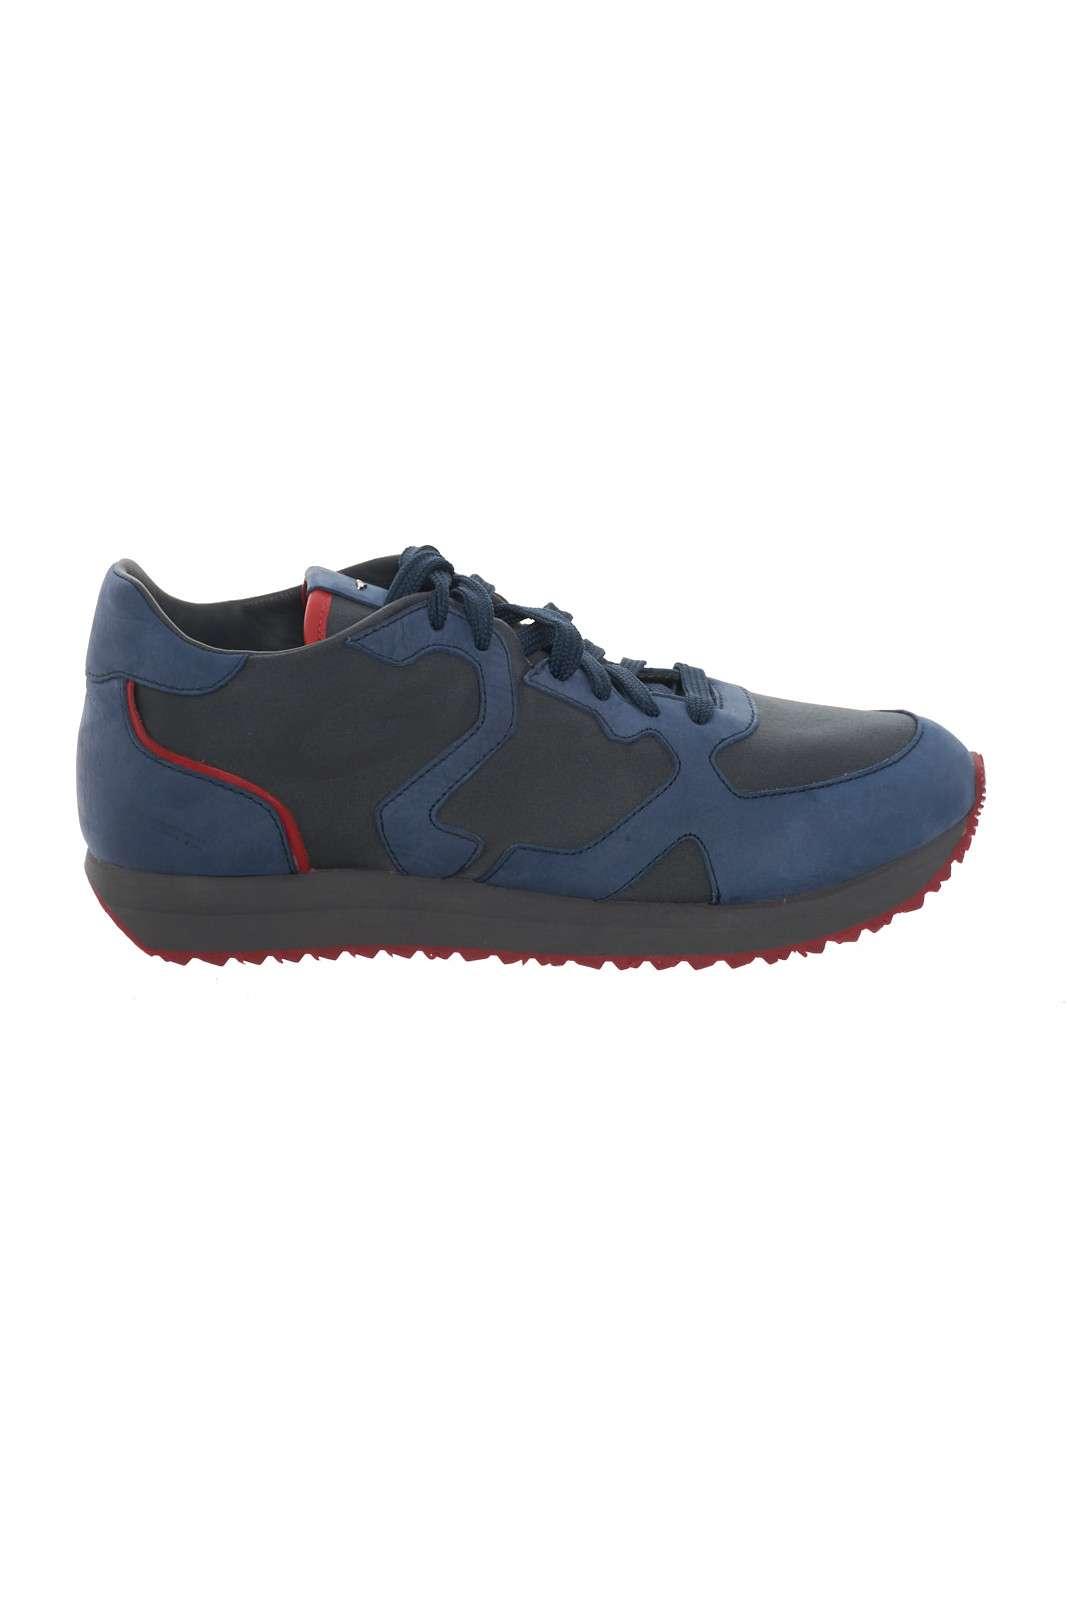 https://www.parmax.com/media/catalog/product/a/i/AI-outlet_parmax-scarpe-uomo-Guardiani-Sport-SU71391C-A.jpg